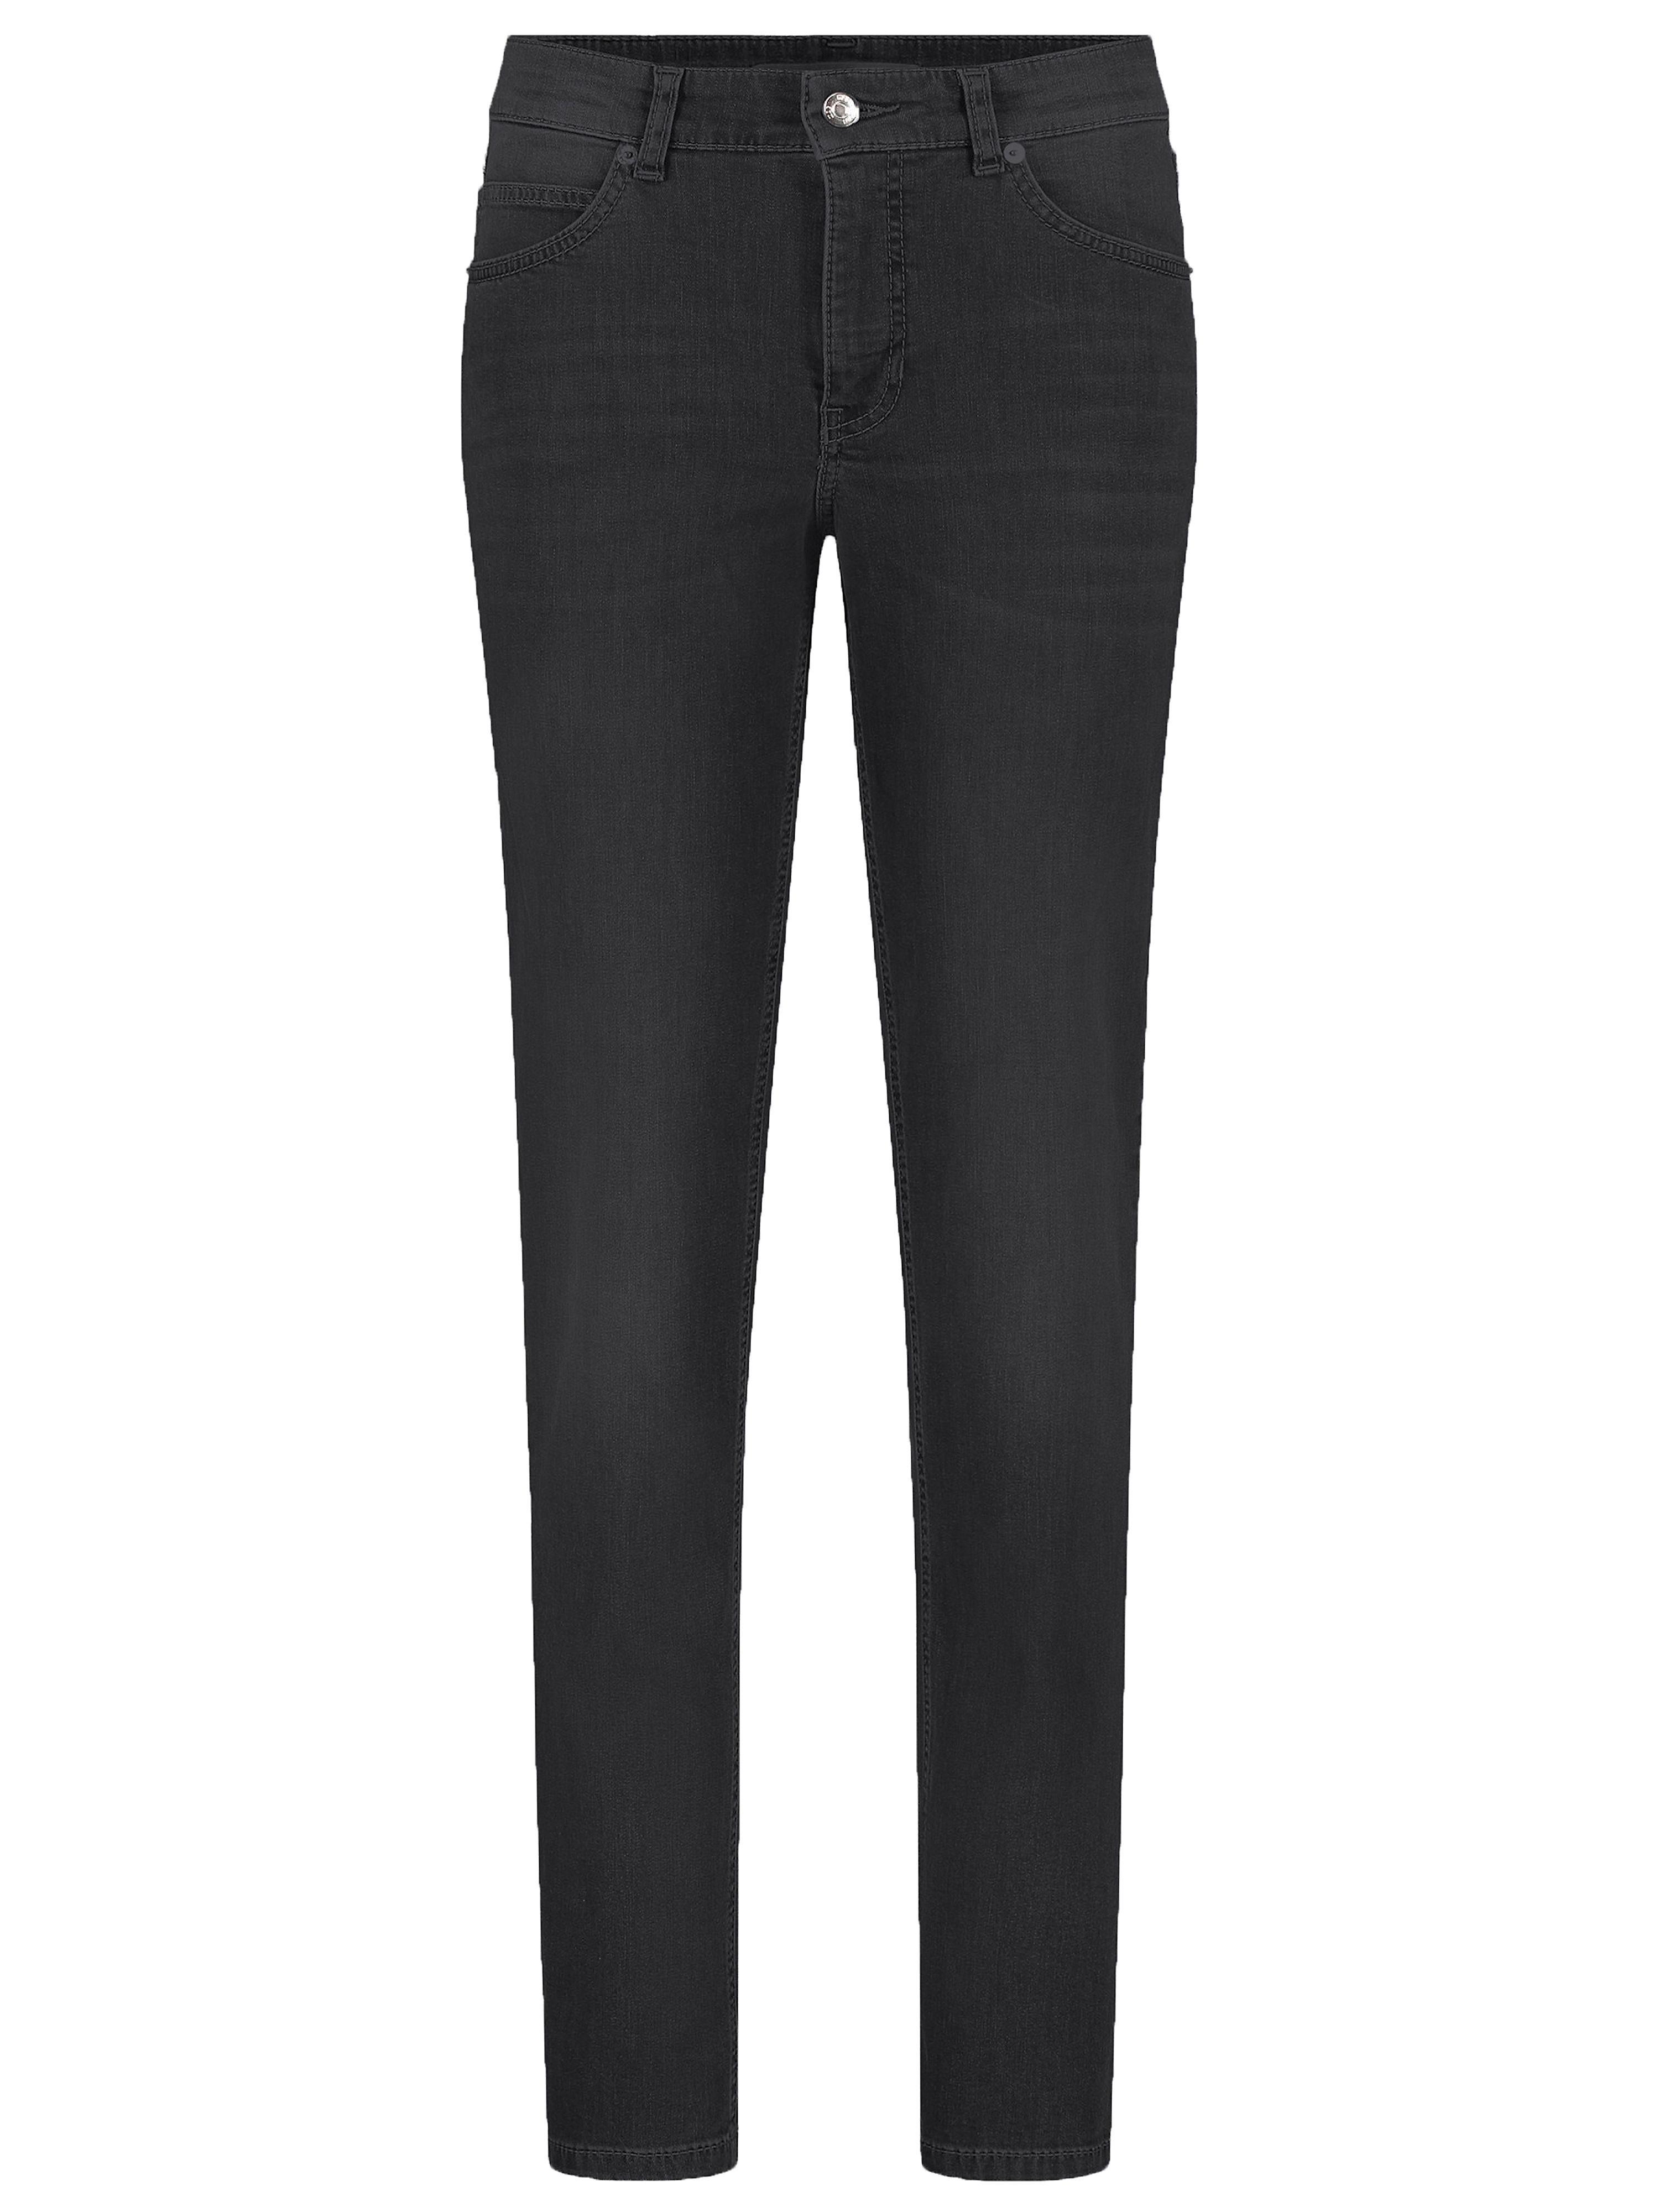 'Feminine Fit'-jeans Inch 32 Van Mac grijs